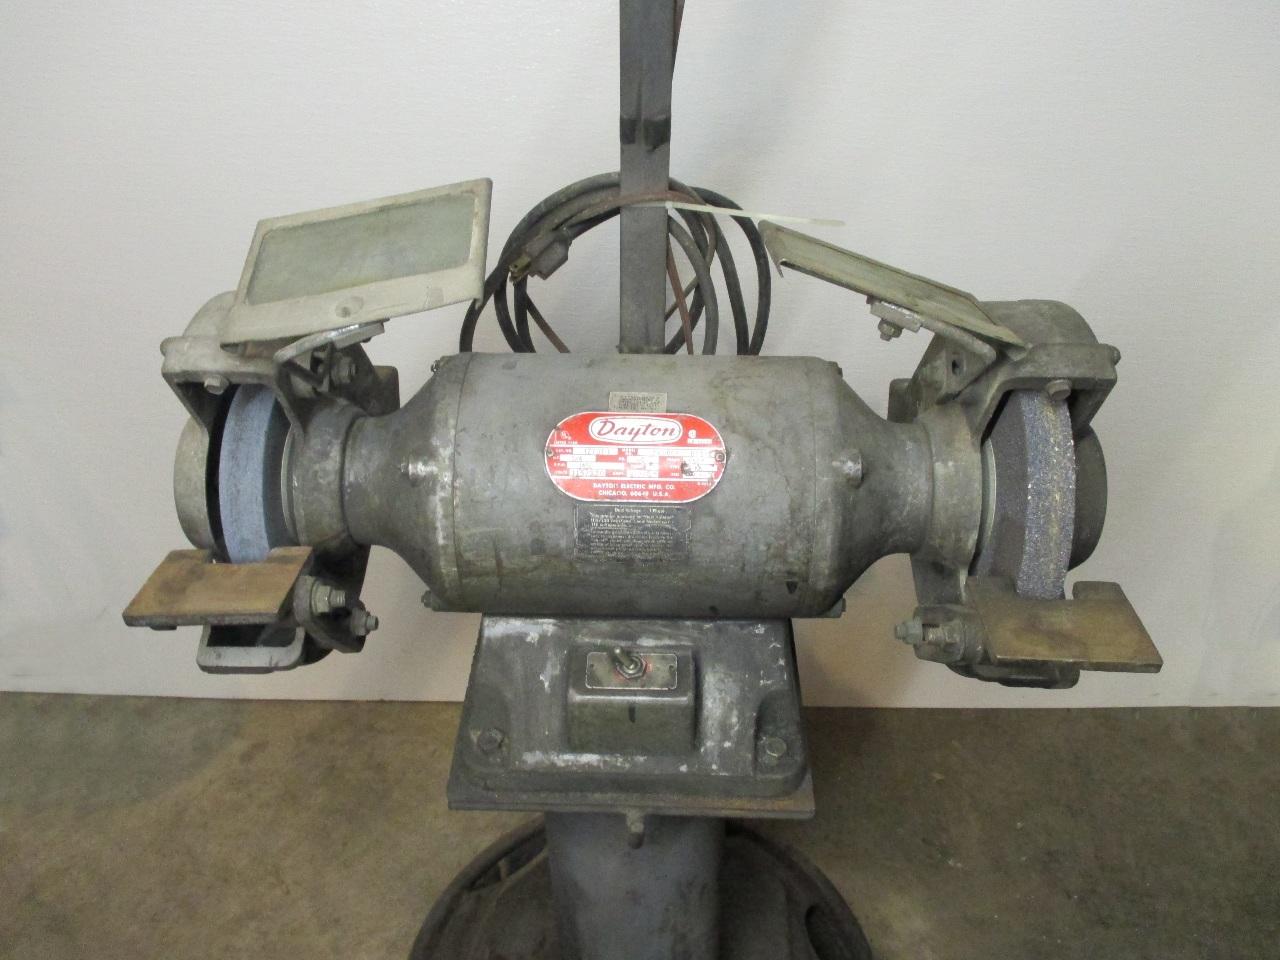 Dayton Motors Wiring Diagram 4z909e. . Wiring Diagram on